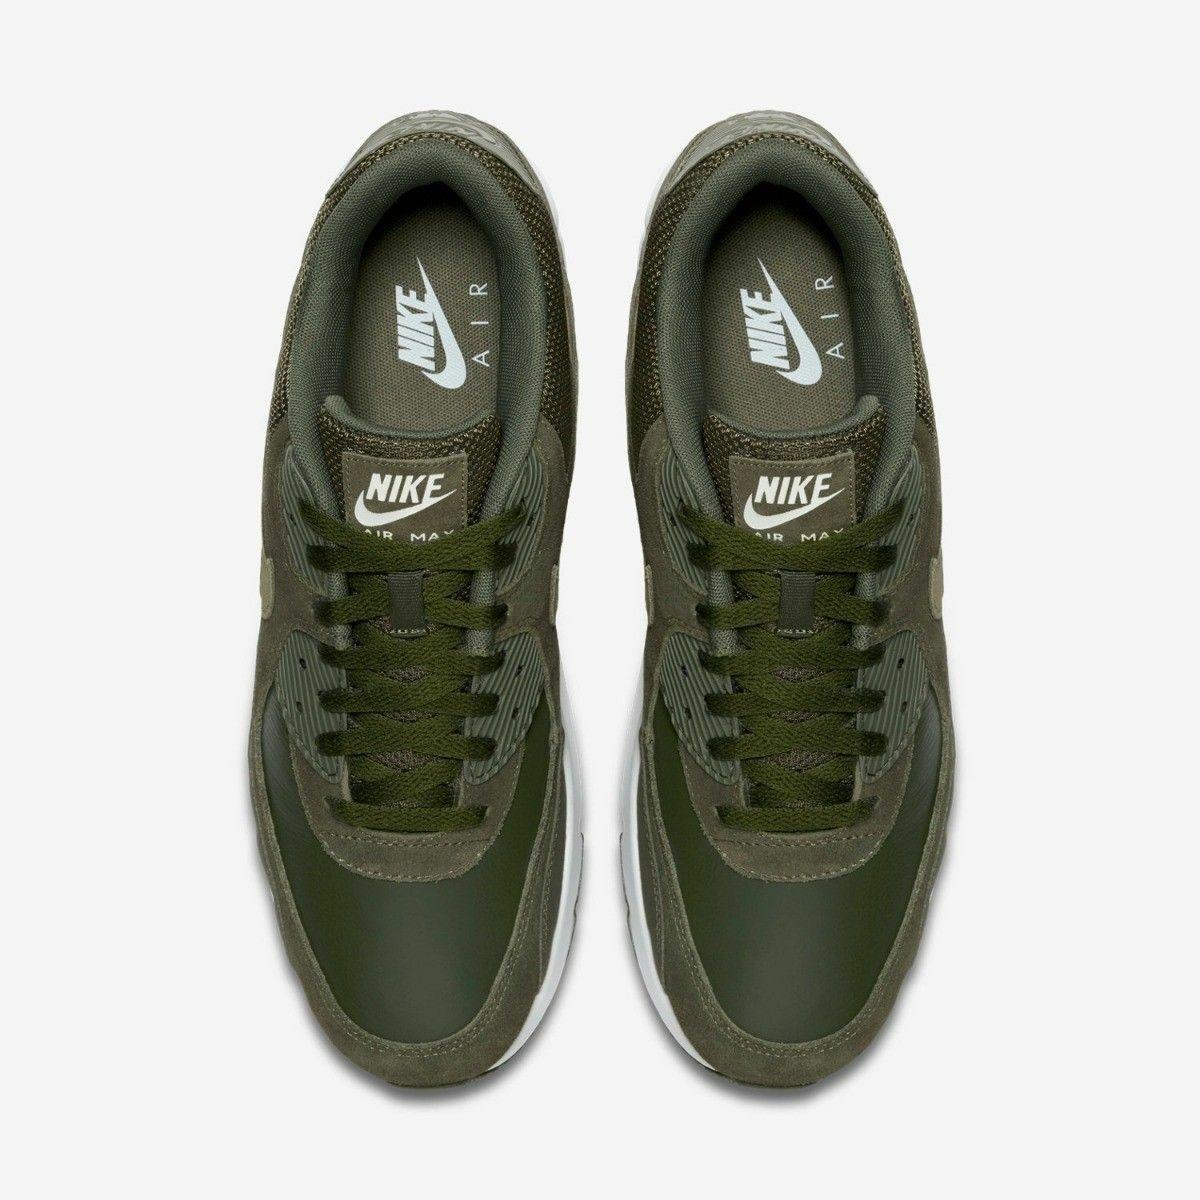 wholesale dealer e8711 a354c ... Nike Air Max 90 Ultra 2.0 2.0 2.0 Ltr 924447-300 Leather Cargo Khaki  Med ...